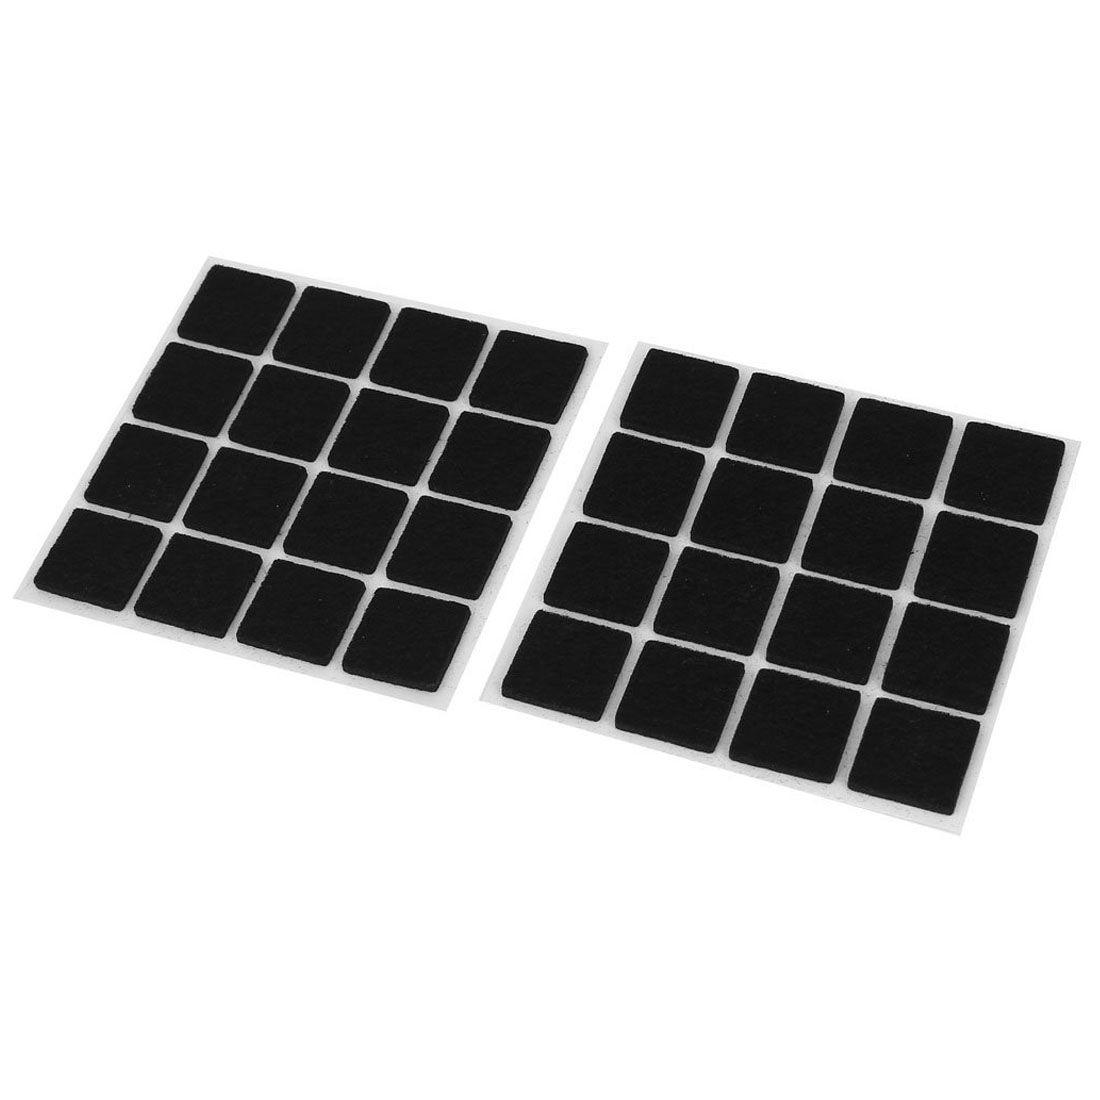 Self Adhesive Floor Protectors Furniture Felt Square Pads 32pcs